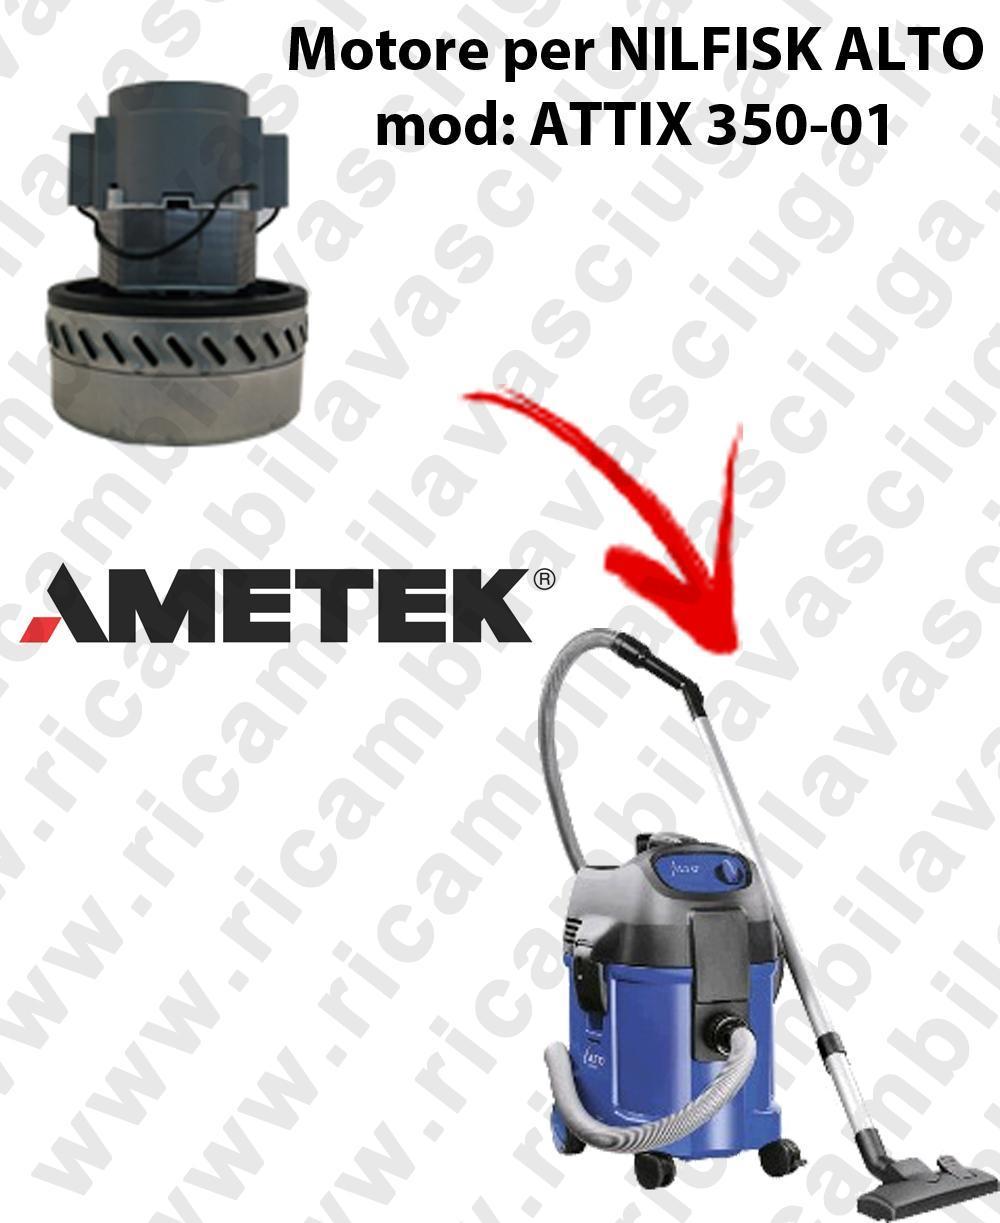 ATTIX 350-01 Ametek Vacuum Motor for vacuum cleaner NILFISK ALTO